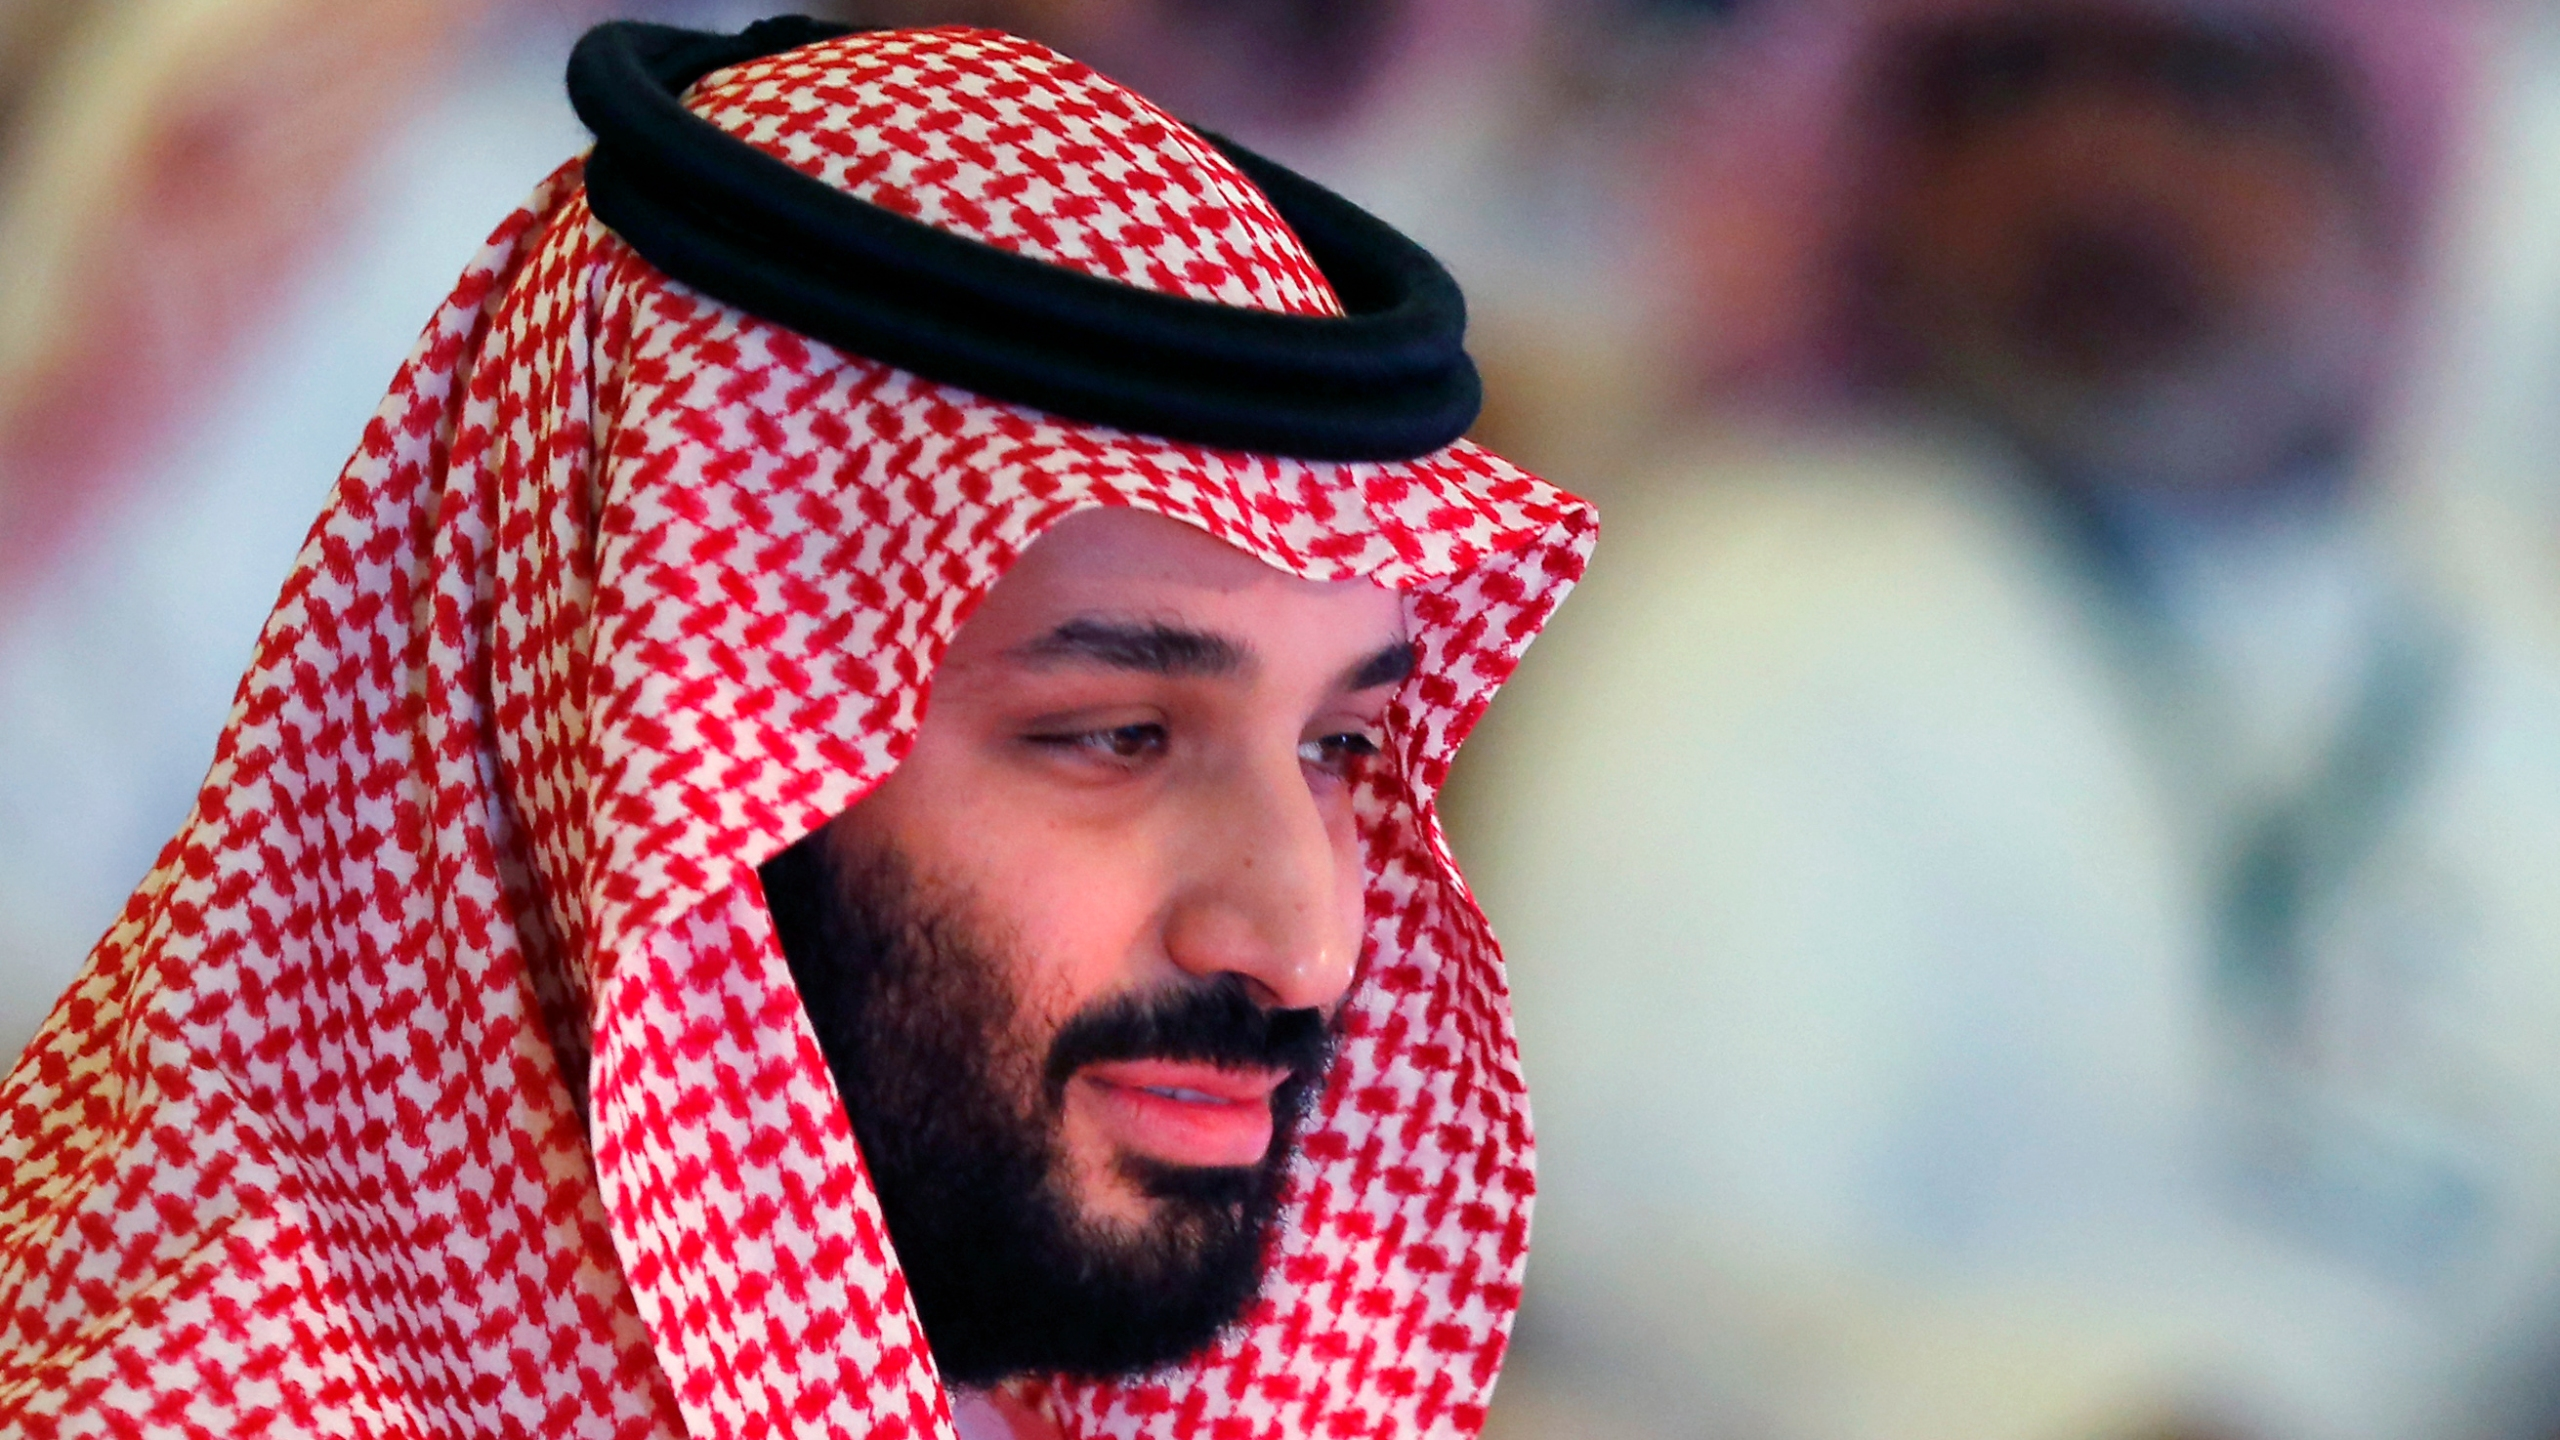 Saudi_Arabia_Investment_Conference_32278-159532.jpg59621675